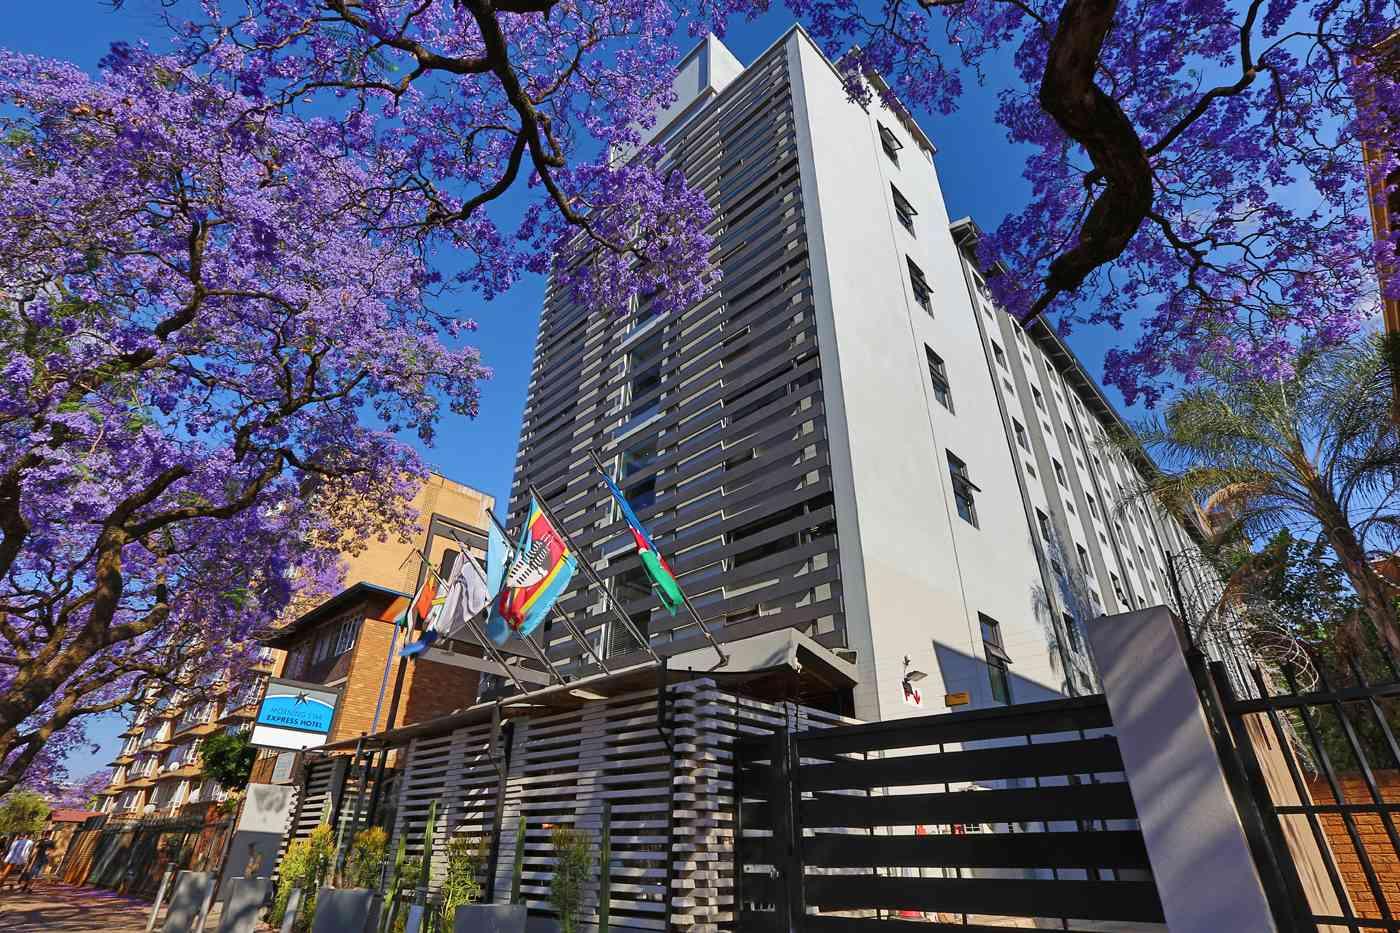 Customer Reviews Of Morning Star Express Hotel Pretoria